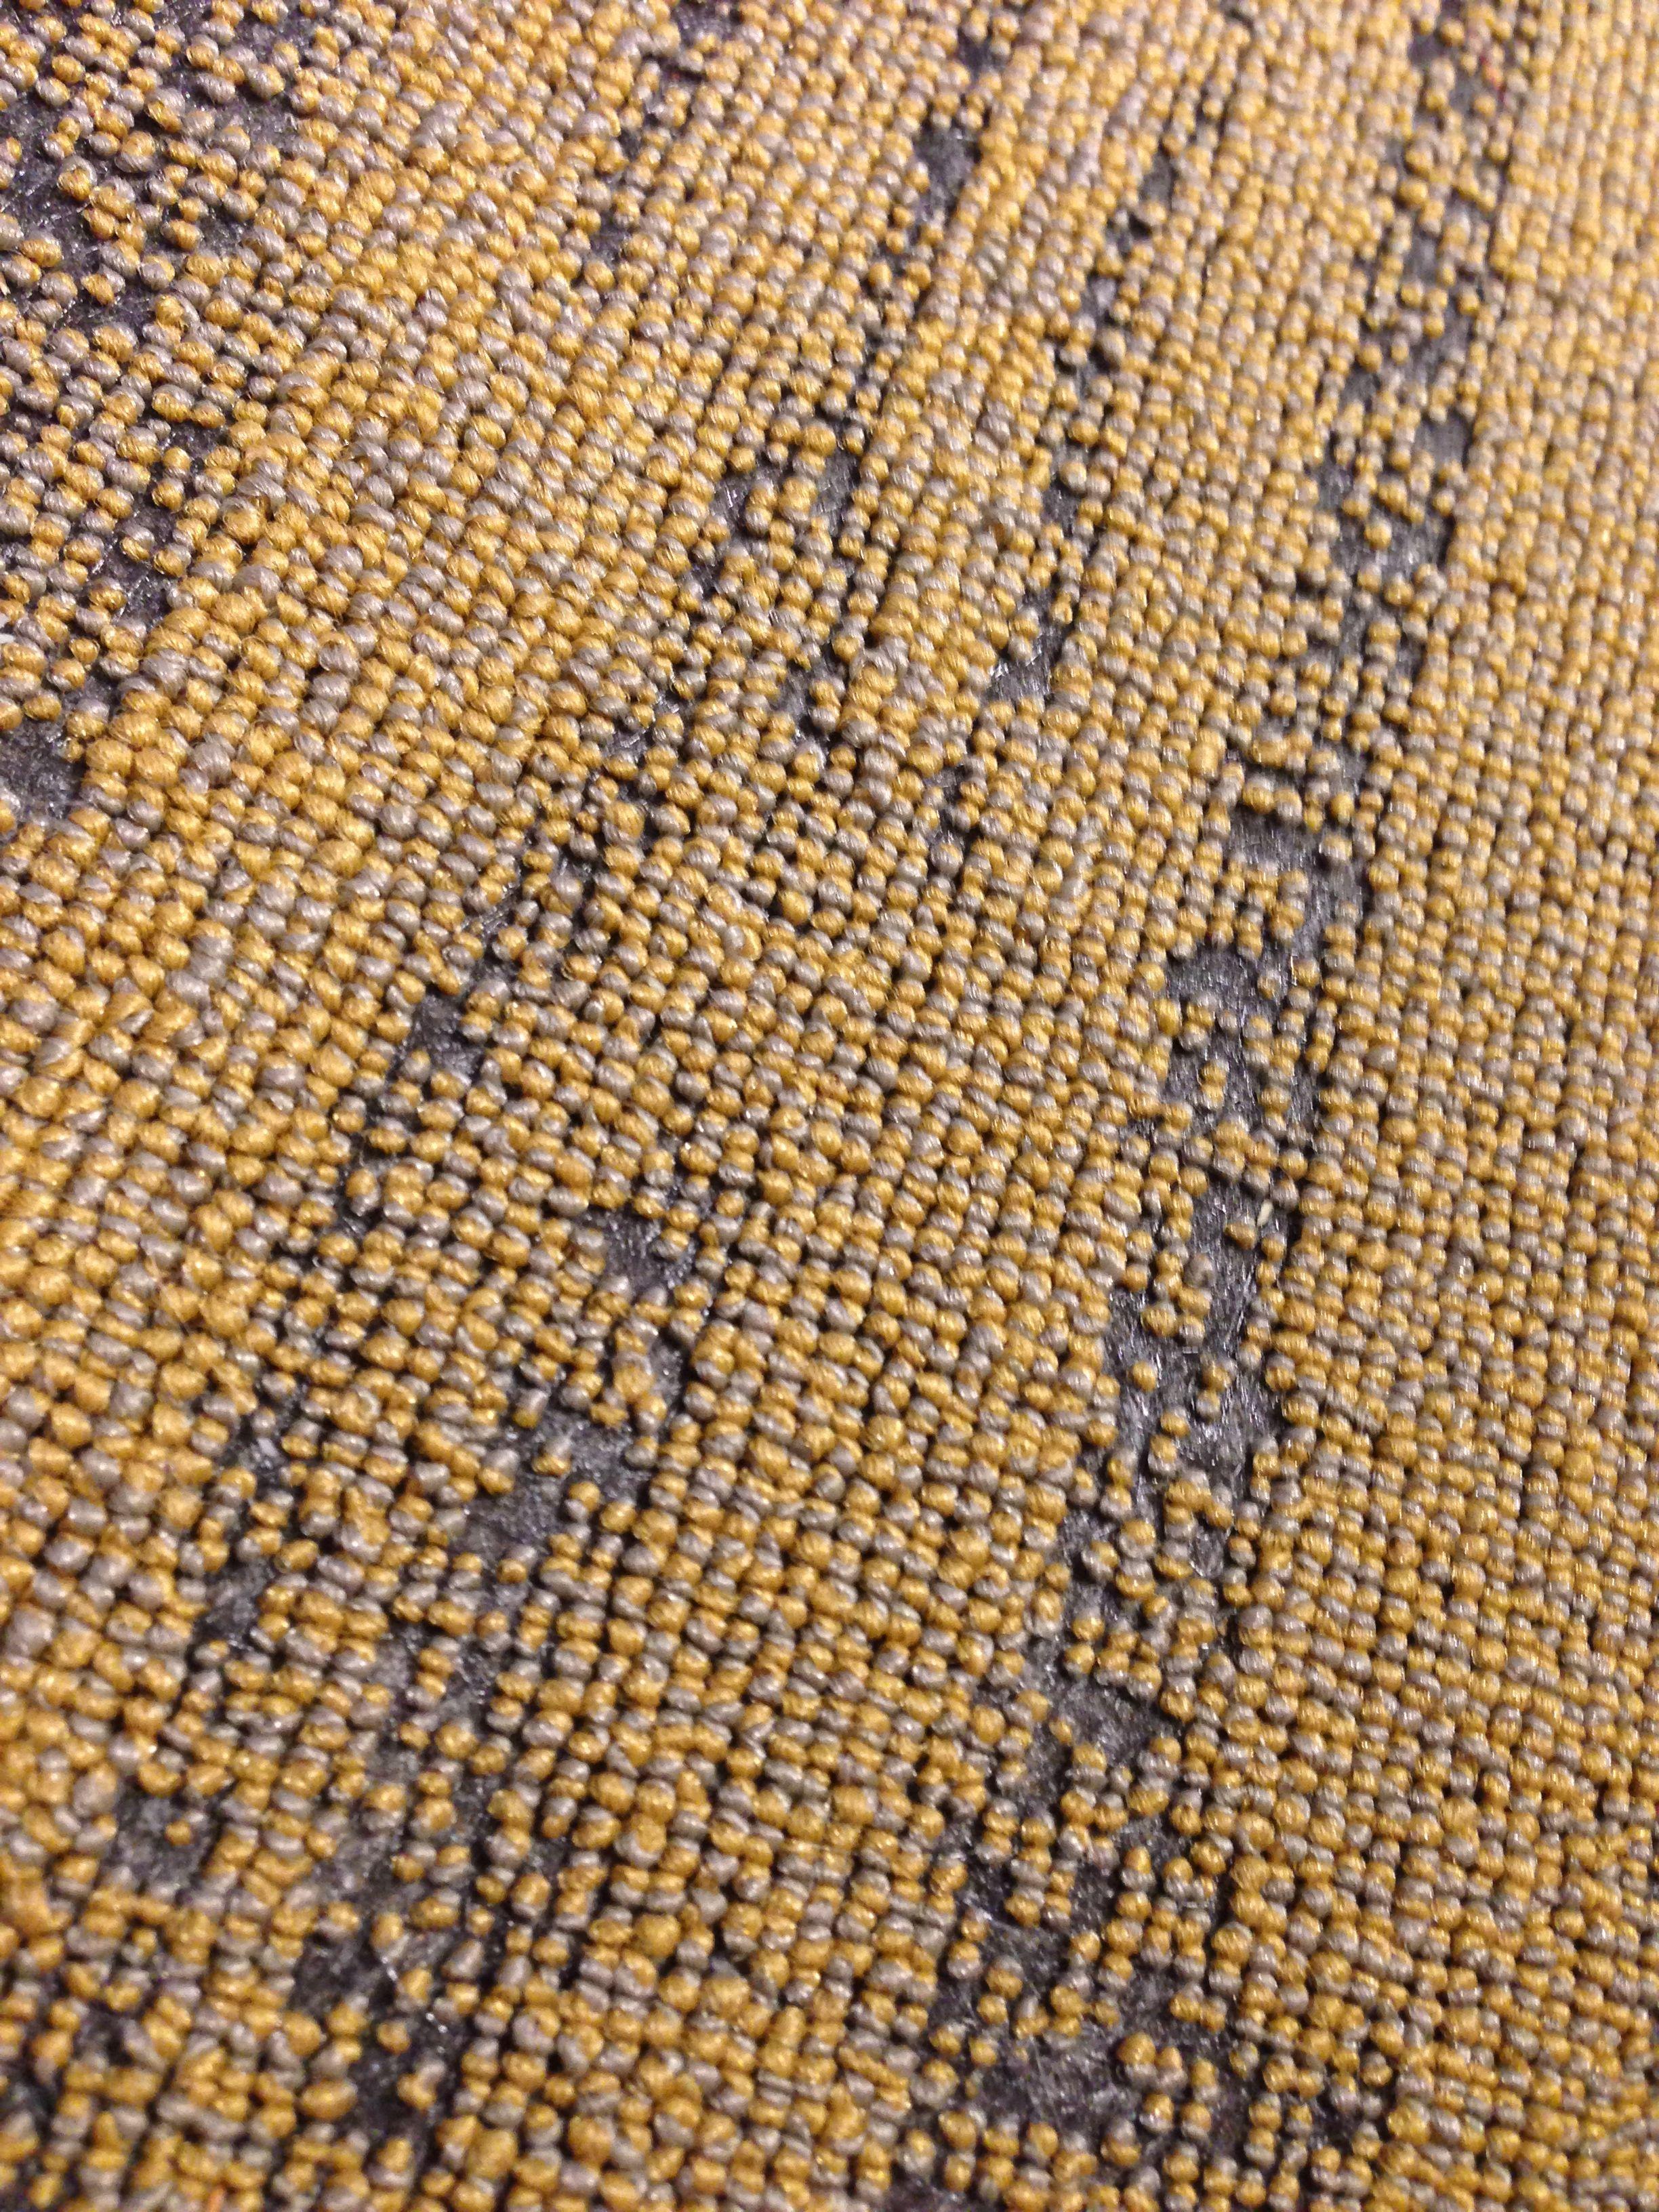 Patcraft Deconstruct Neocon 2013 Commercial Flooring